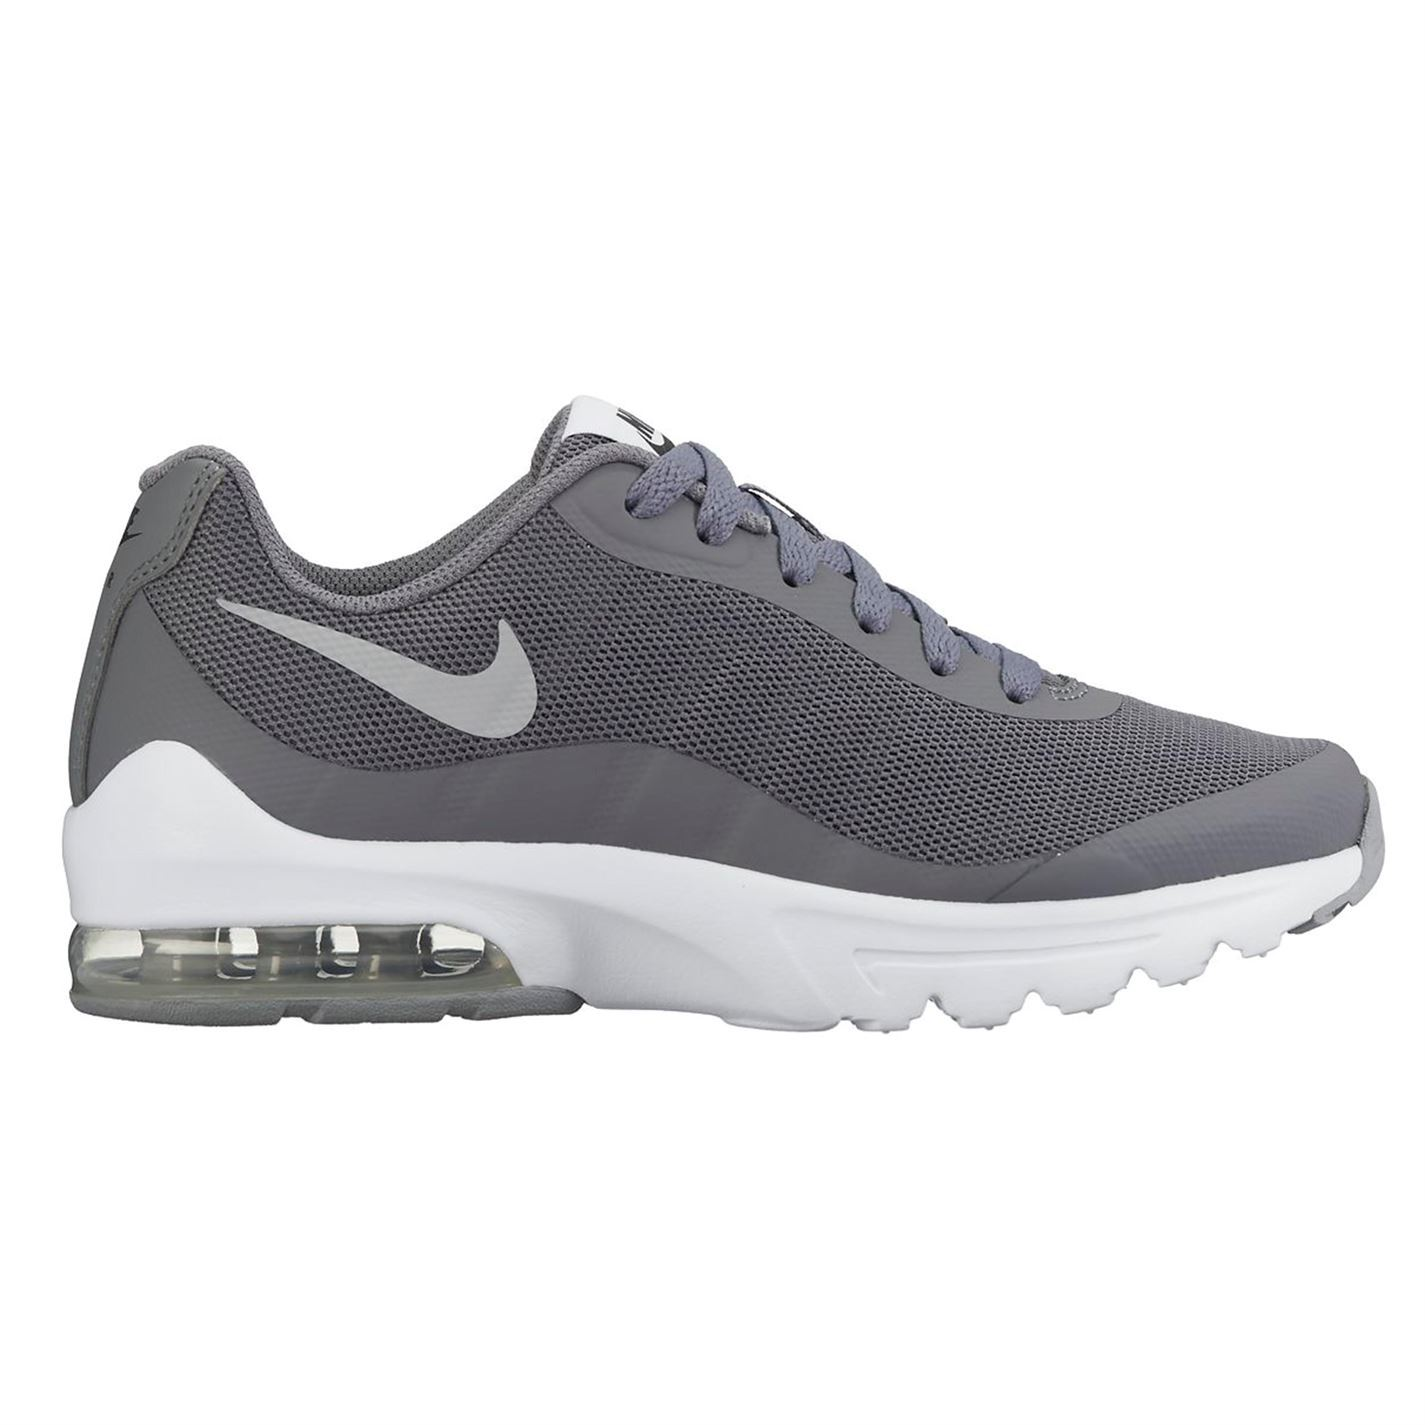 0546890487eda Nike Air Max Invigor Trainers Junior Boys Shoes Footwear | eBay